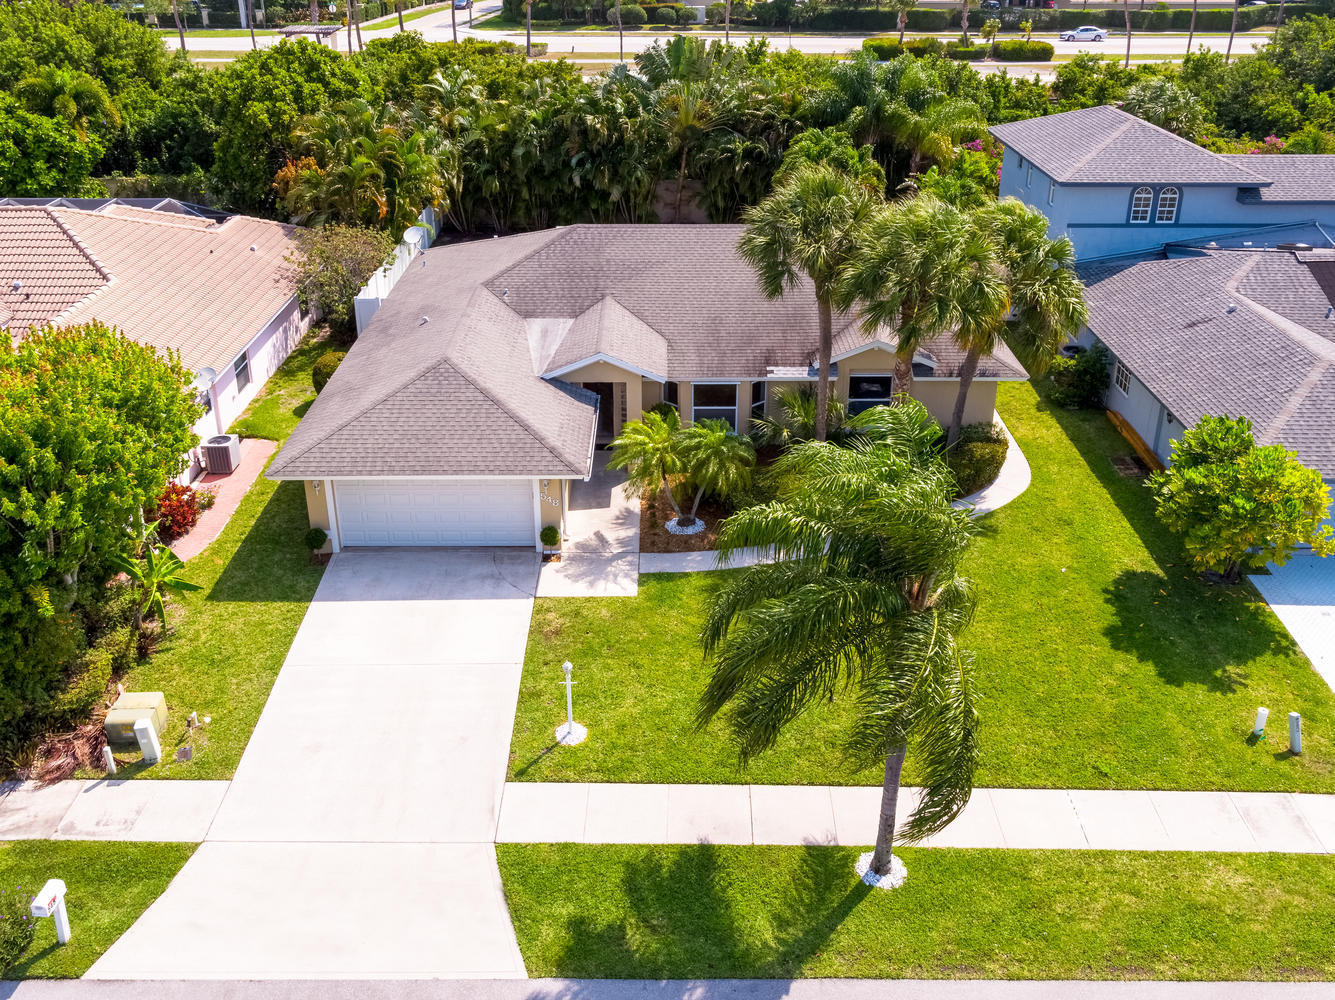 548 Cypress Drive, Tequesta, Florida 33469, 3 Bedrooms Bedrooms, ,2 BathroomsBathrooms,A,Single family,Cypress,RX-10617074